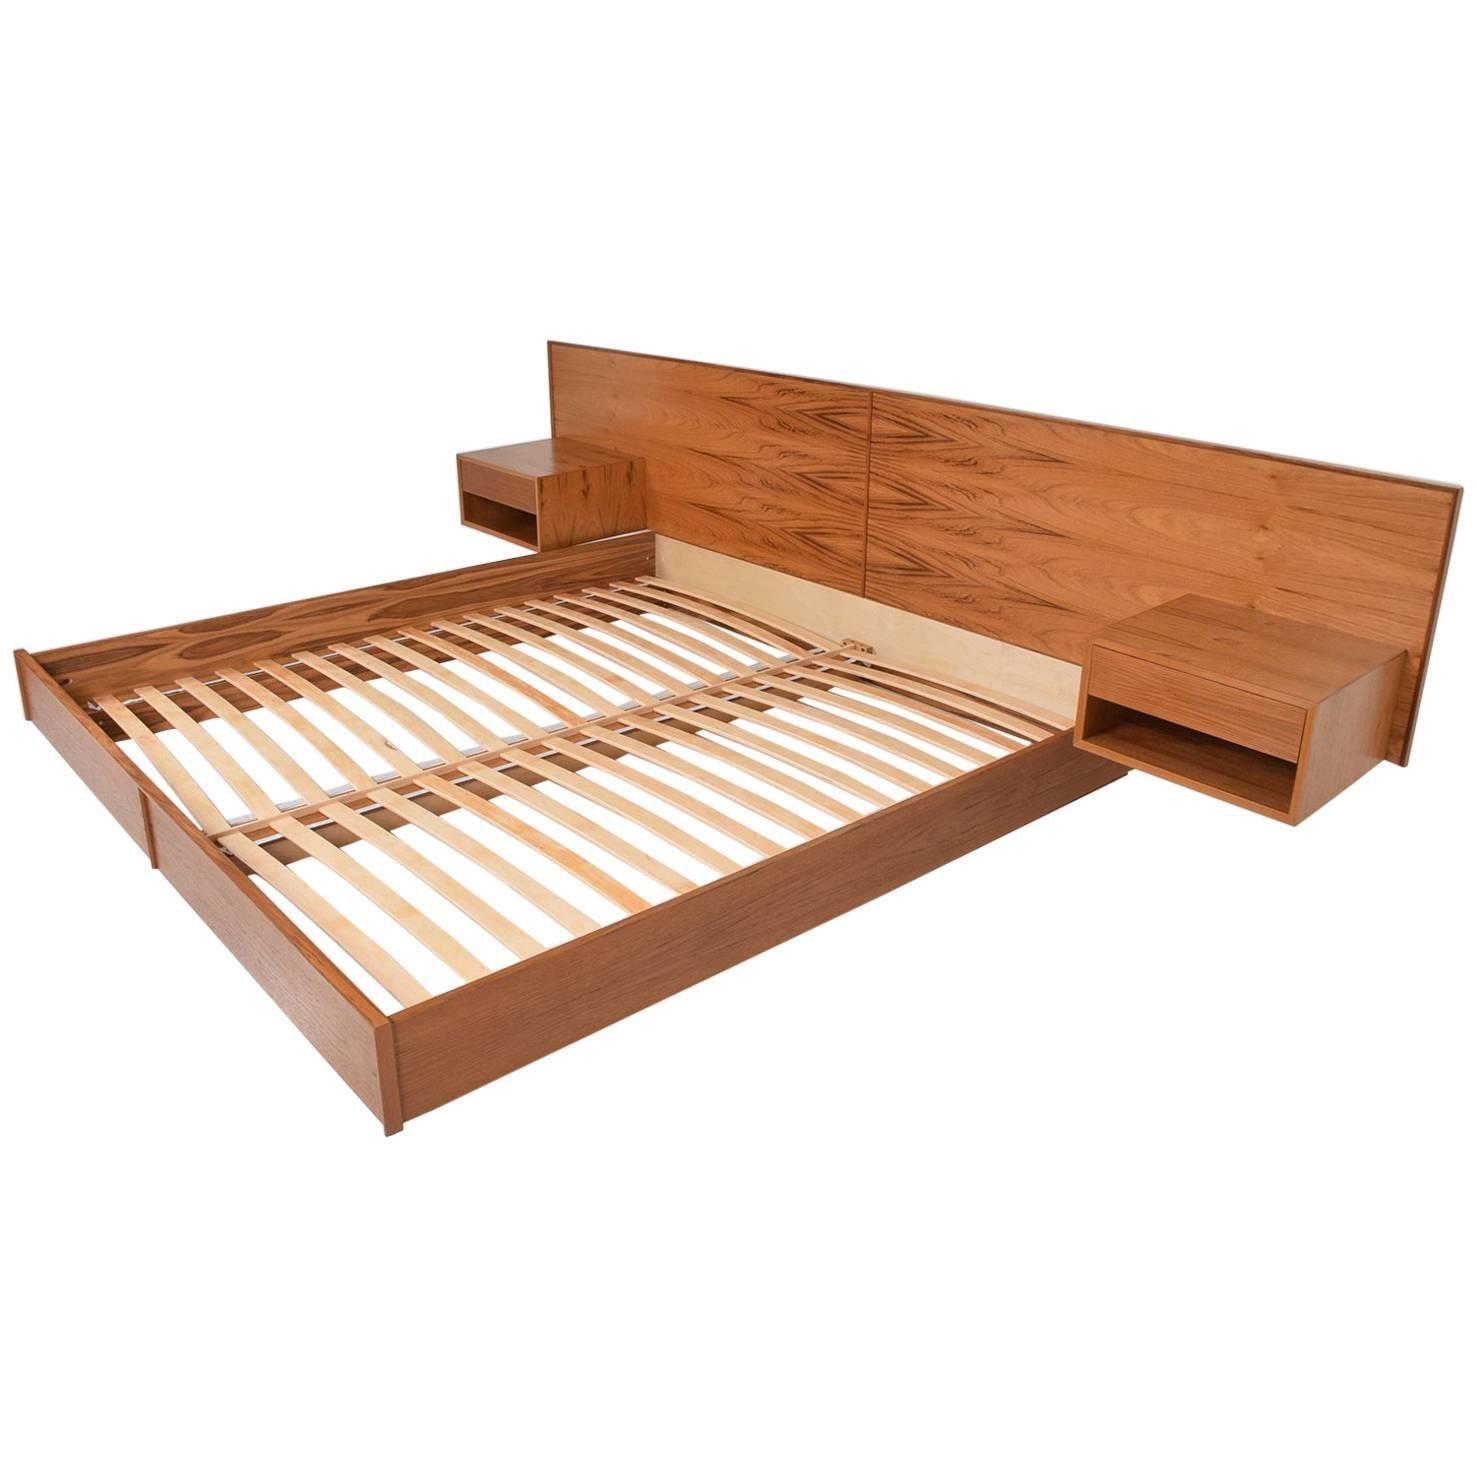 Incroyable Custom Modern Oak King Size Platform Bed With Floating Nightstands